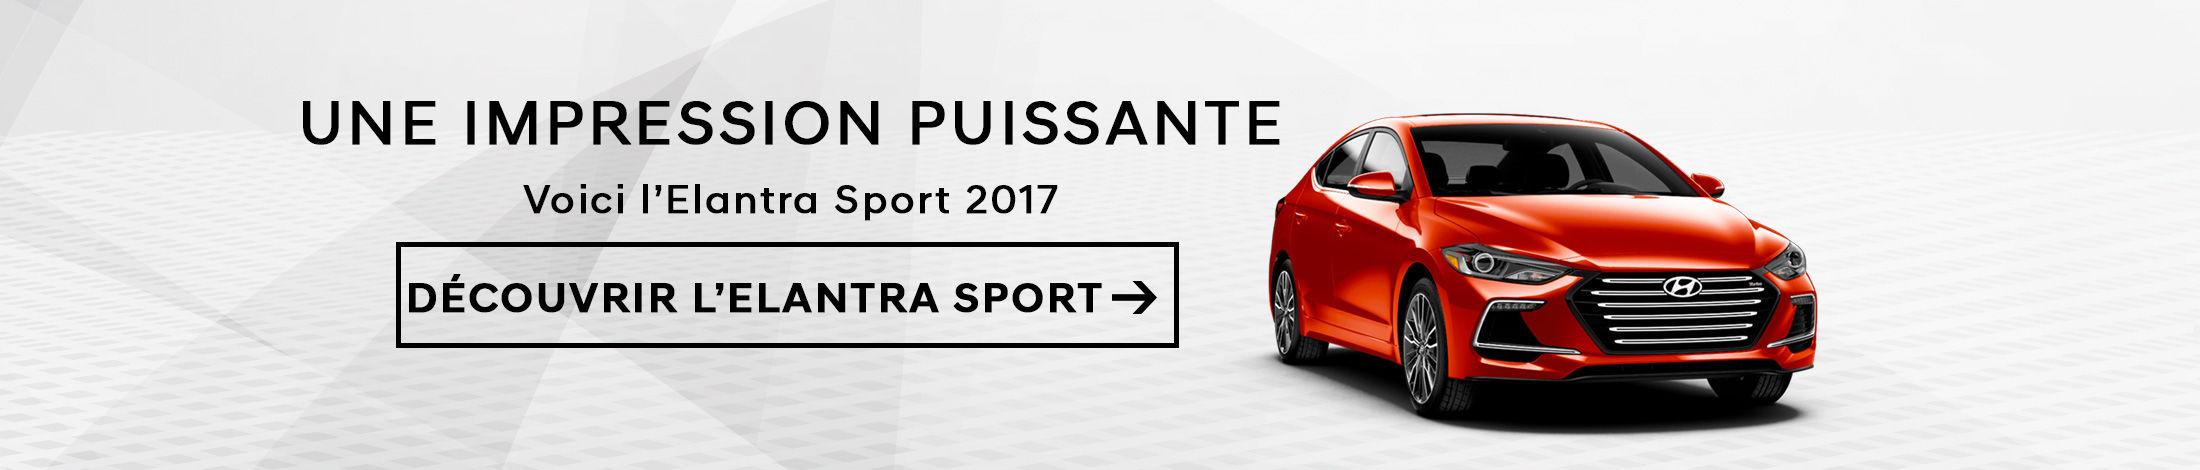 Elantra sport 2017 betty